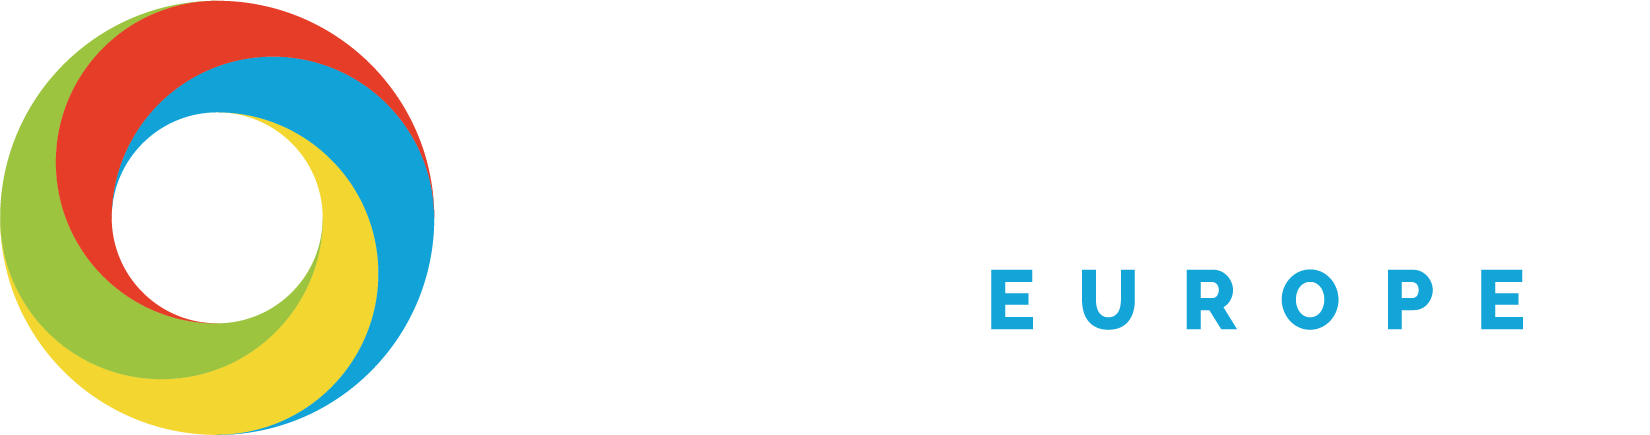 Direct Affinity Europe